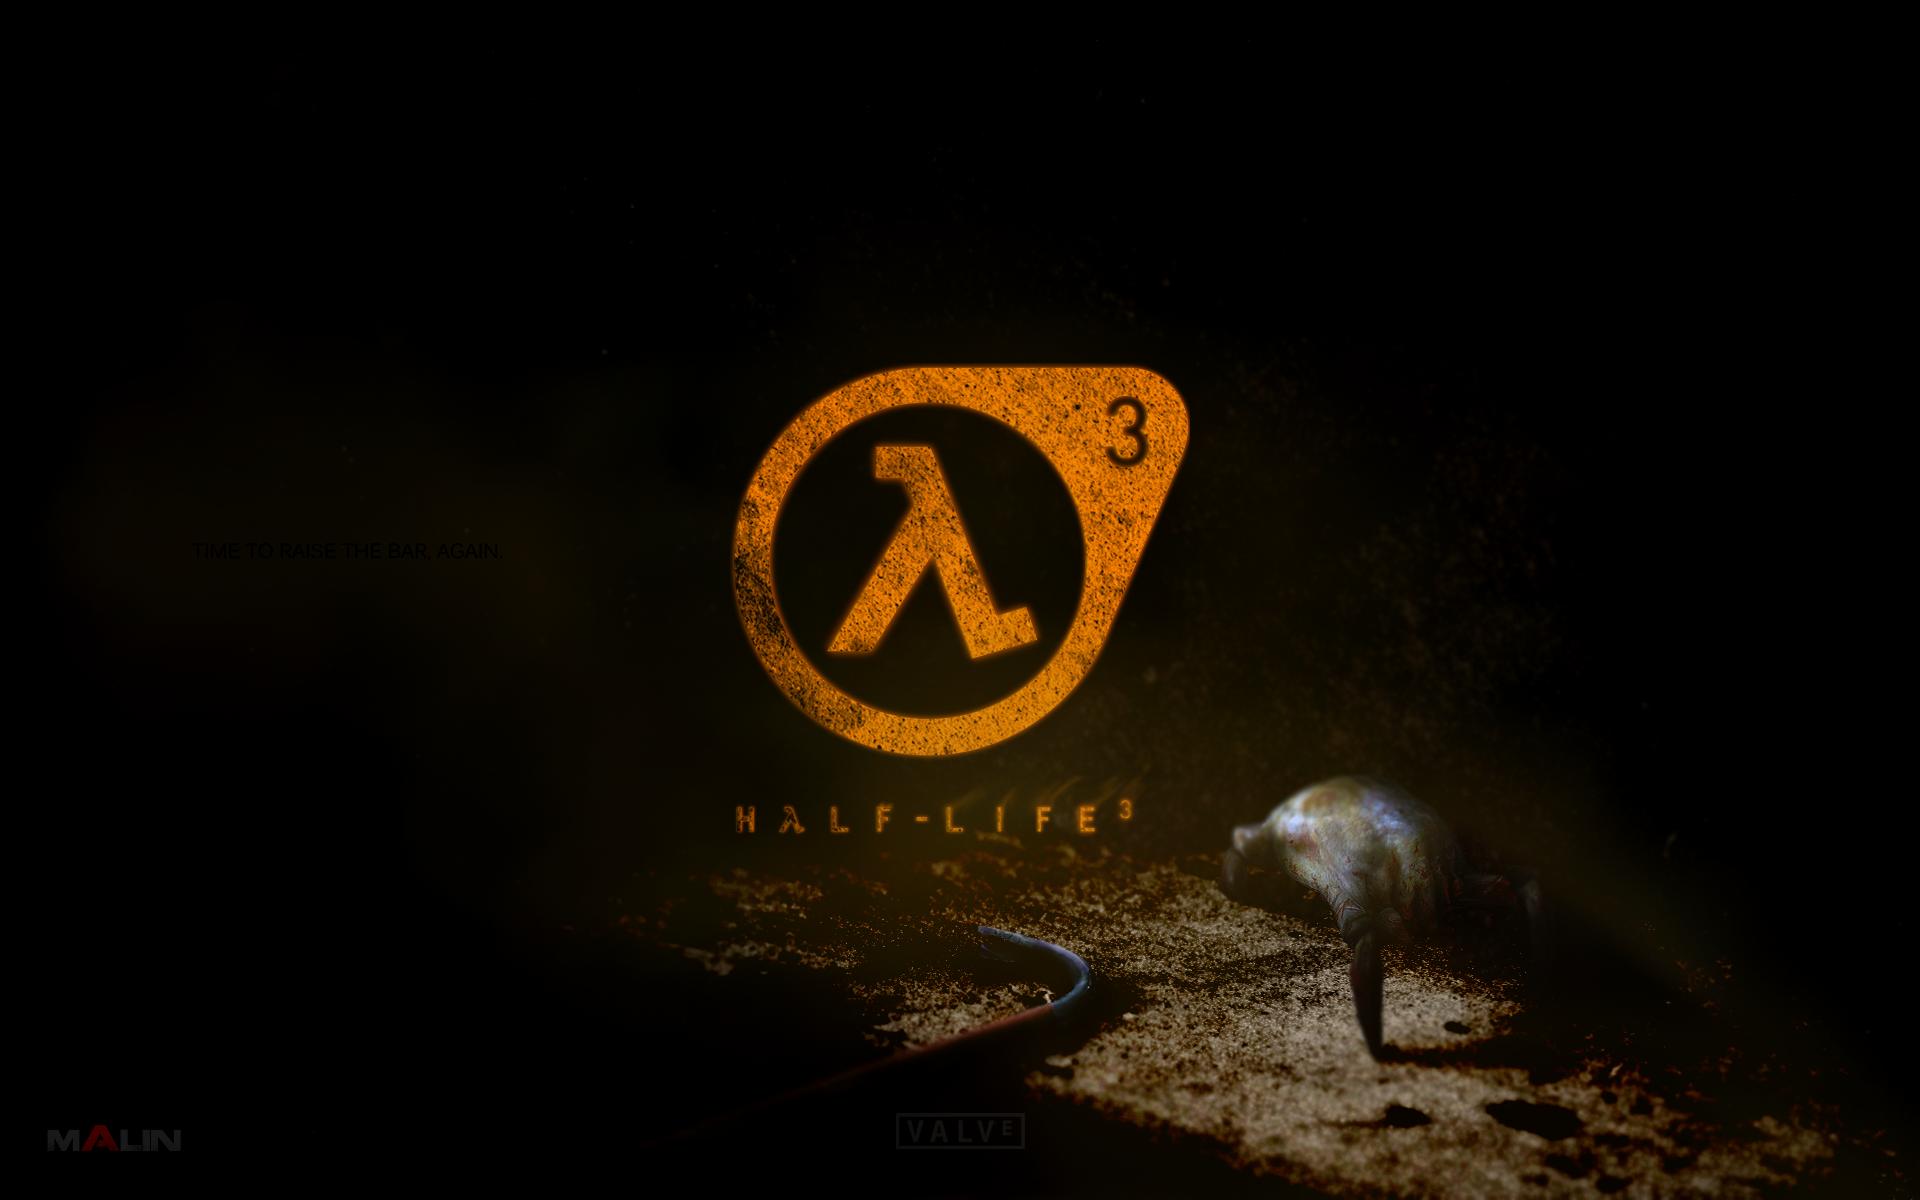 Half-Life 3 Logo with Headcrab 16:10 wallpaper